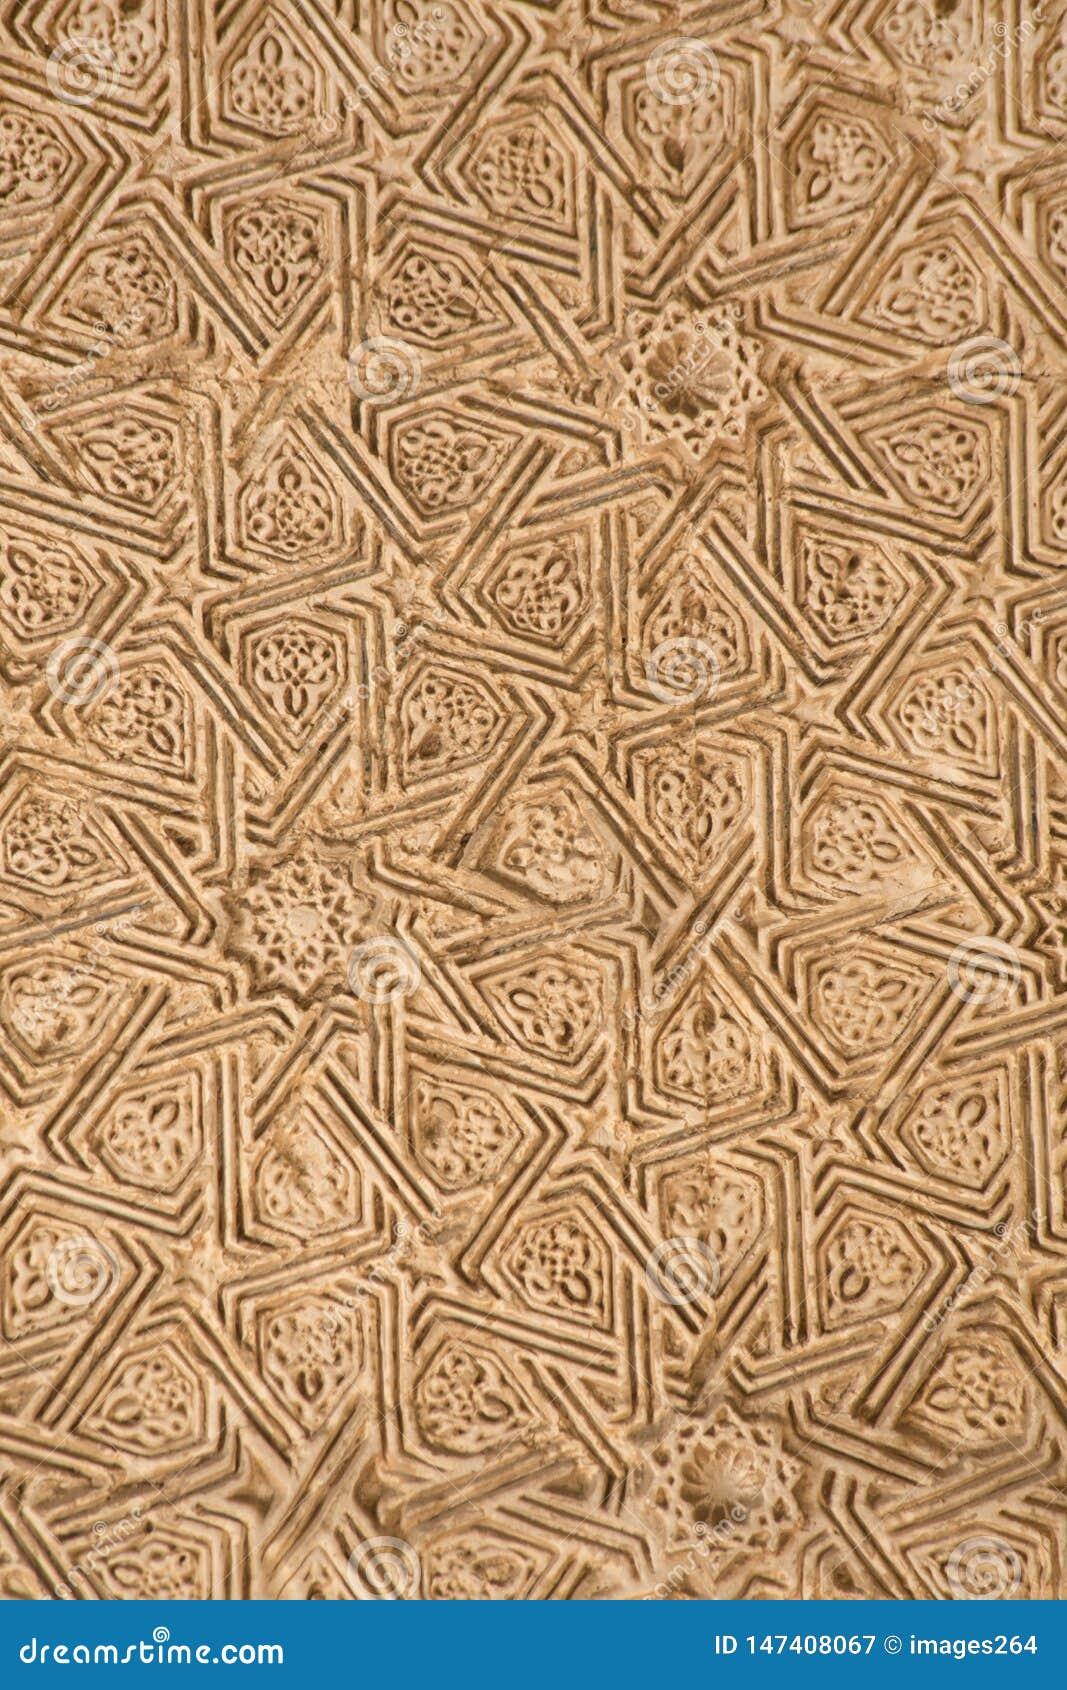 Wooden carved decoration of Alhambra